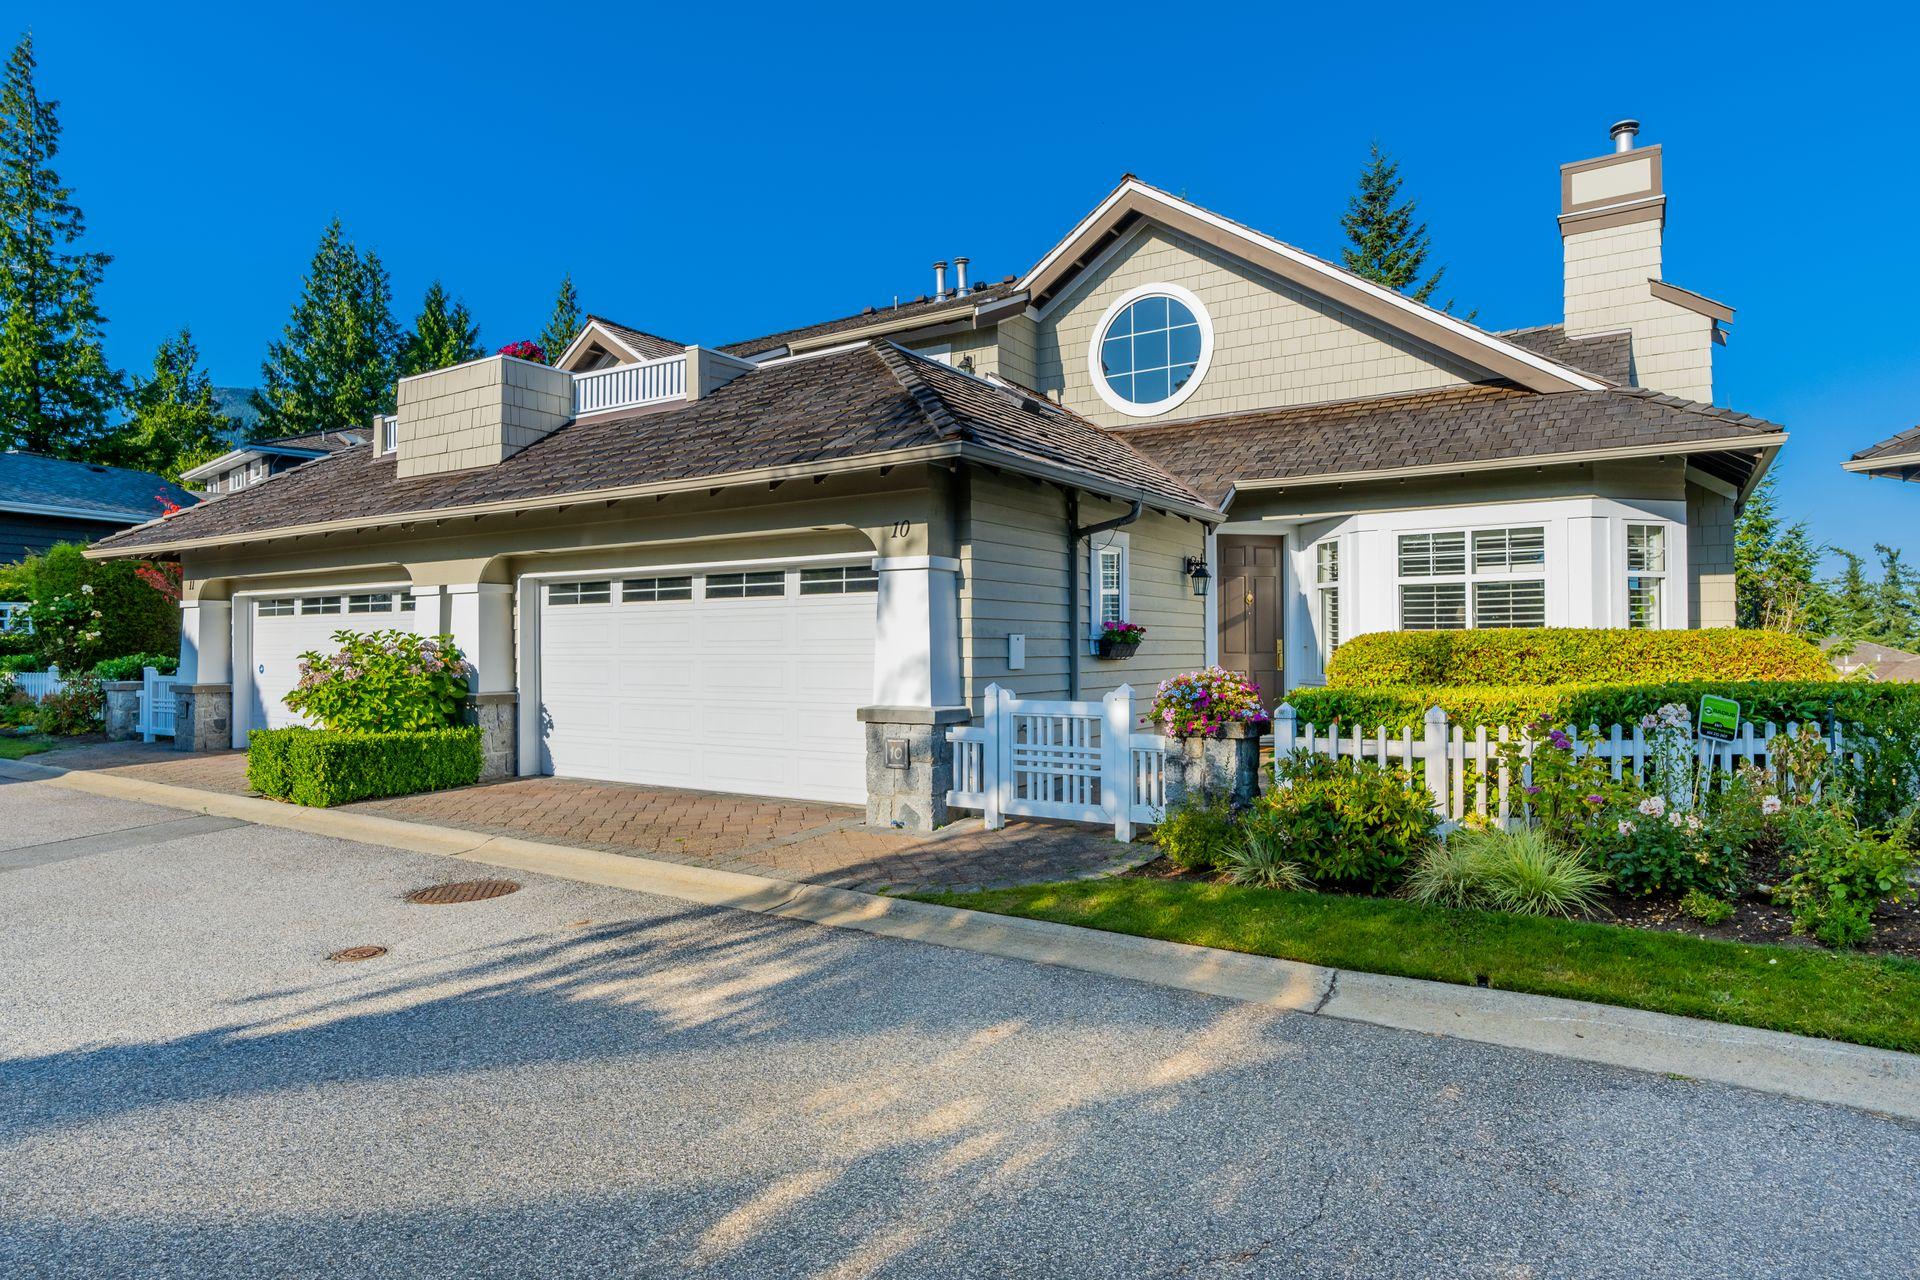 Entrance at 10 - 5130 Ashfeild Road, Upper Caulfeild, West Vancouver